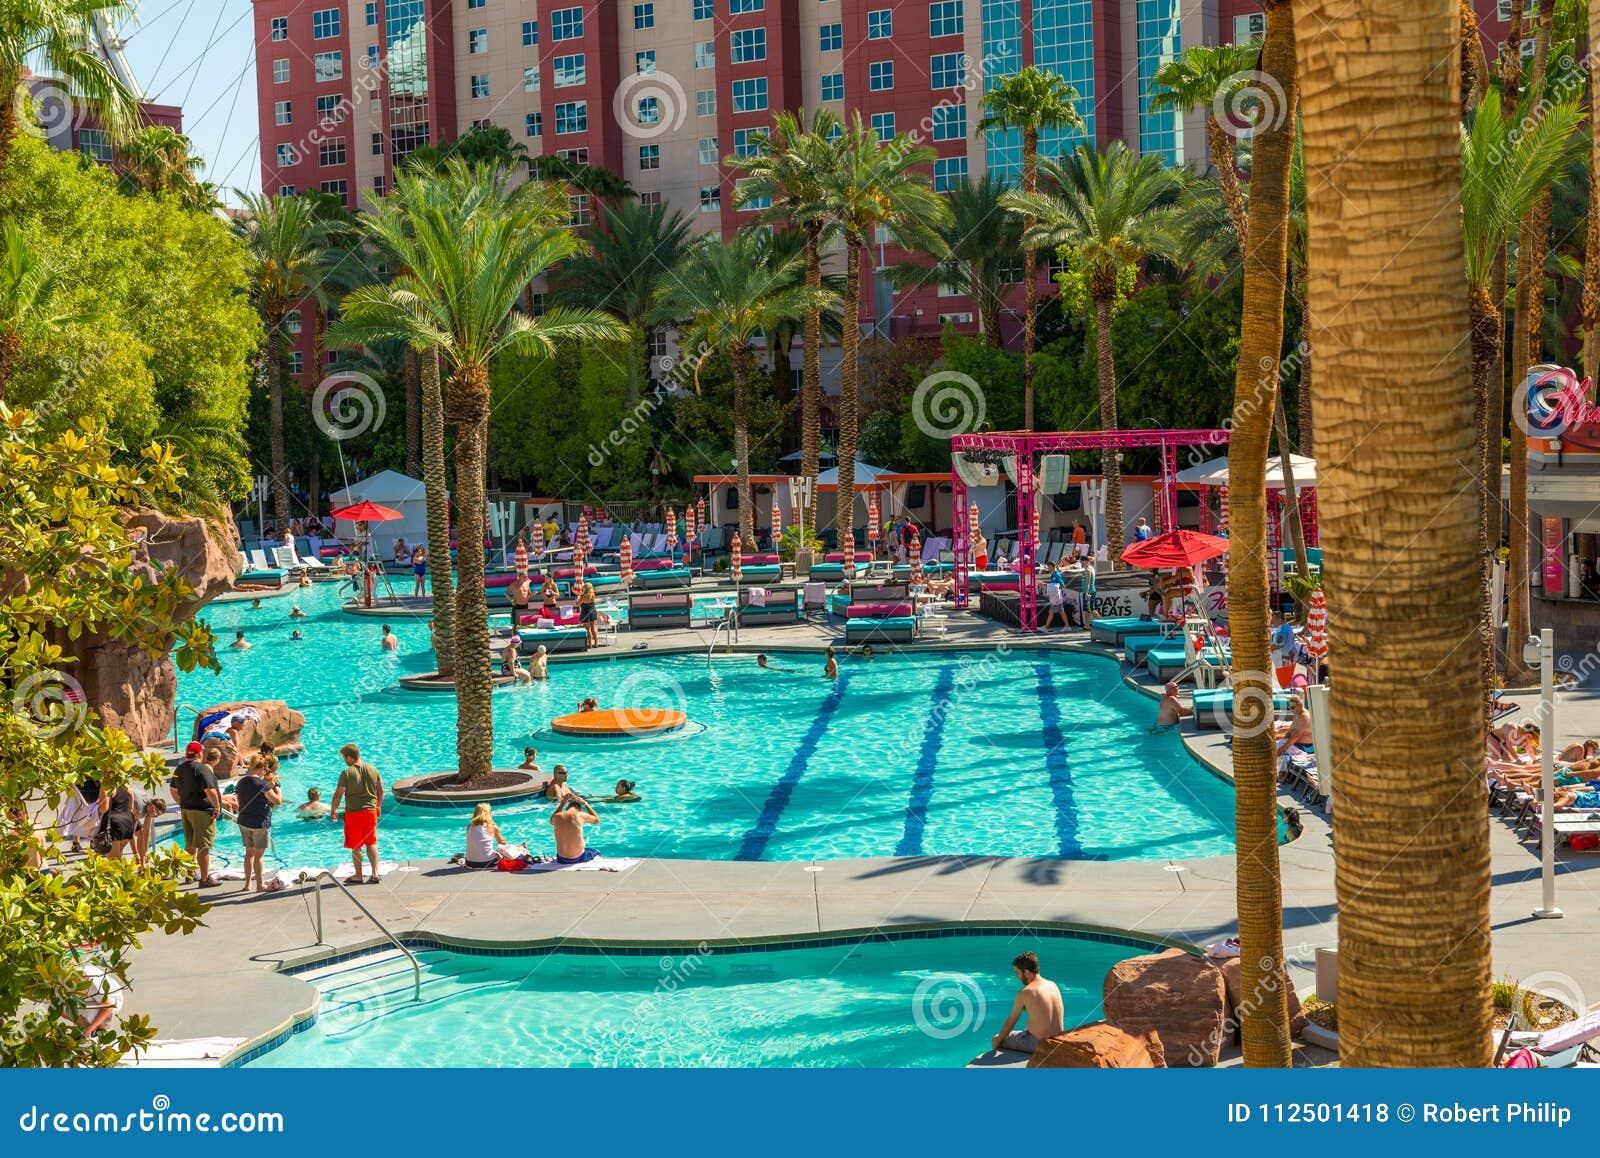 The Flamingo Hilton Hotel Resort Pool Editorial Stock Photo